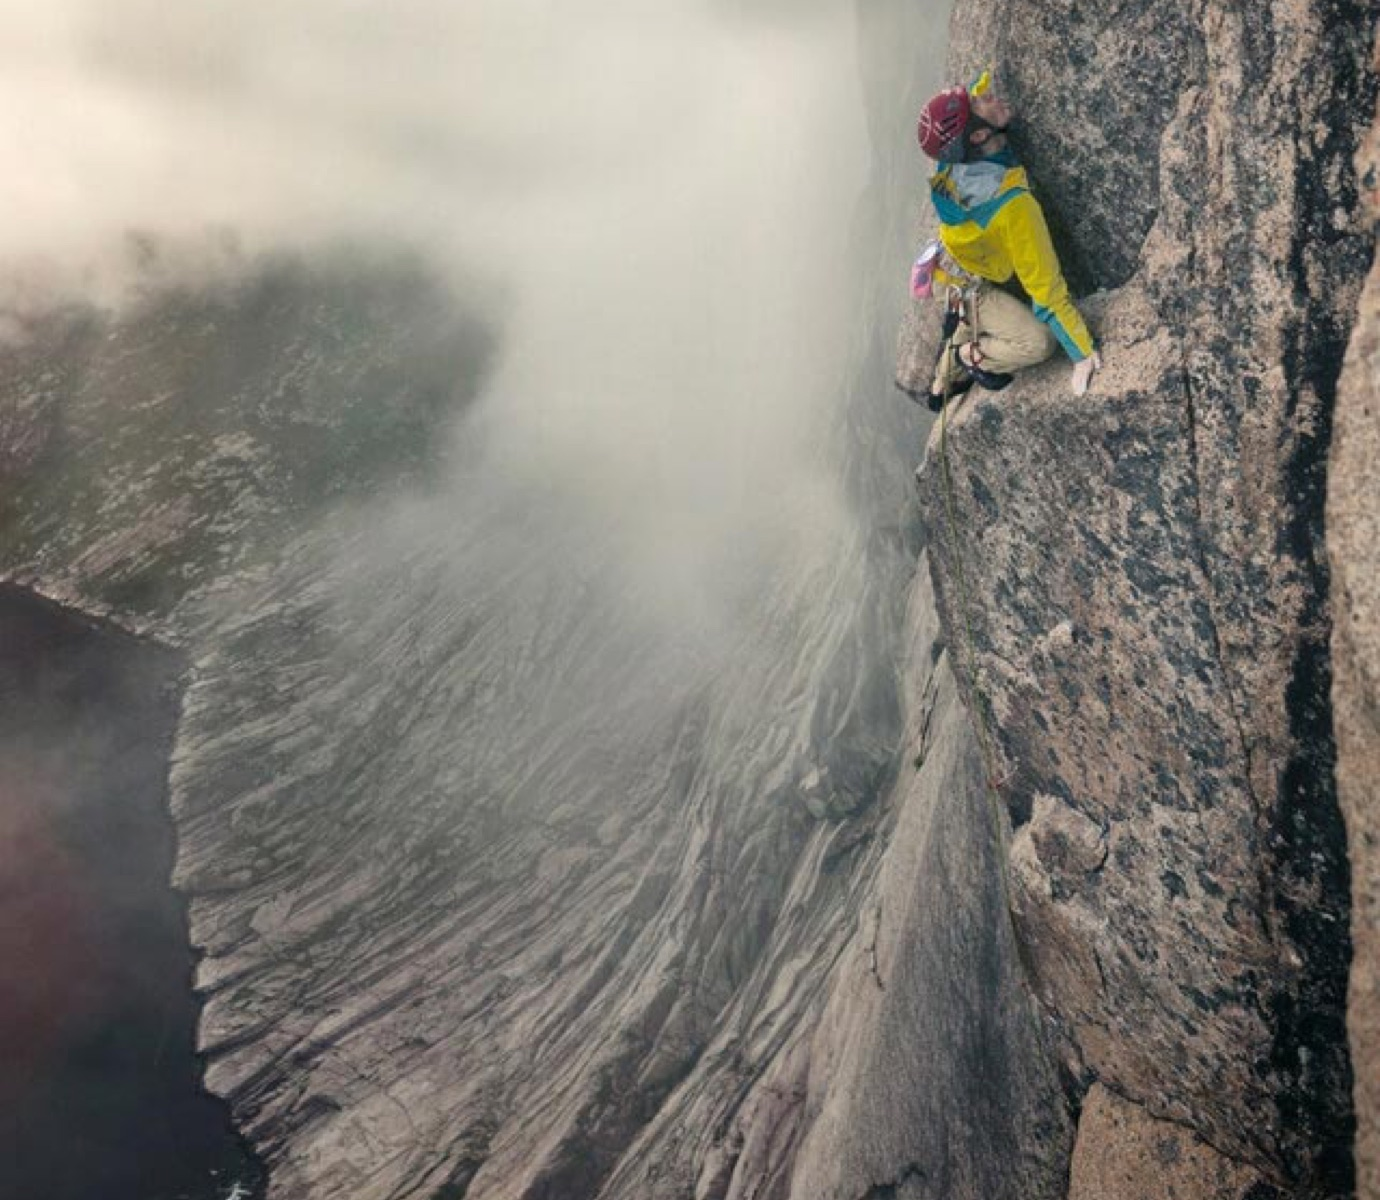 Climber high up on a mountain ledge